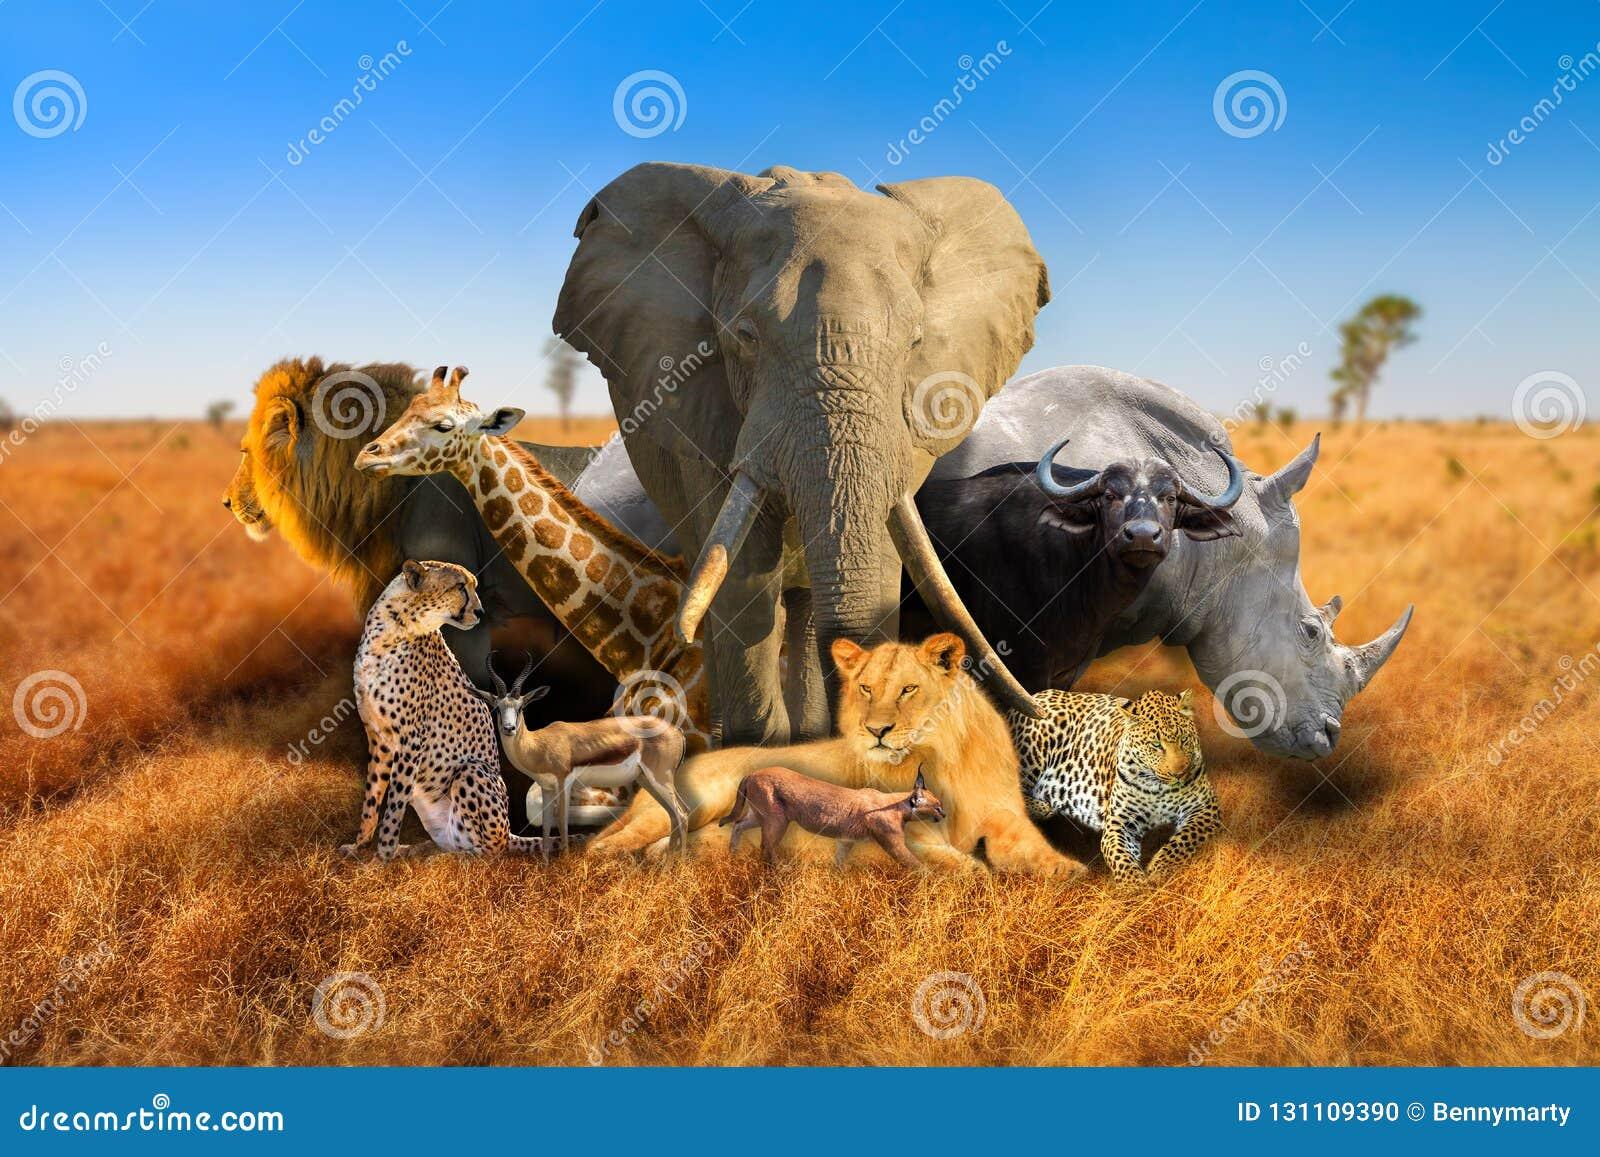 Wild african animals composition